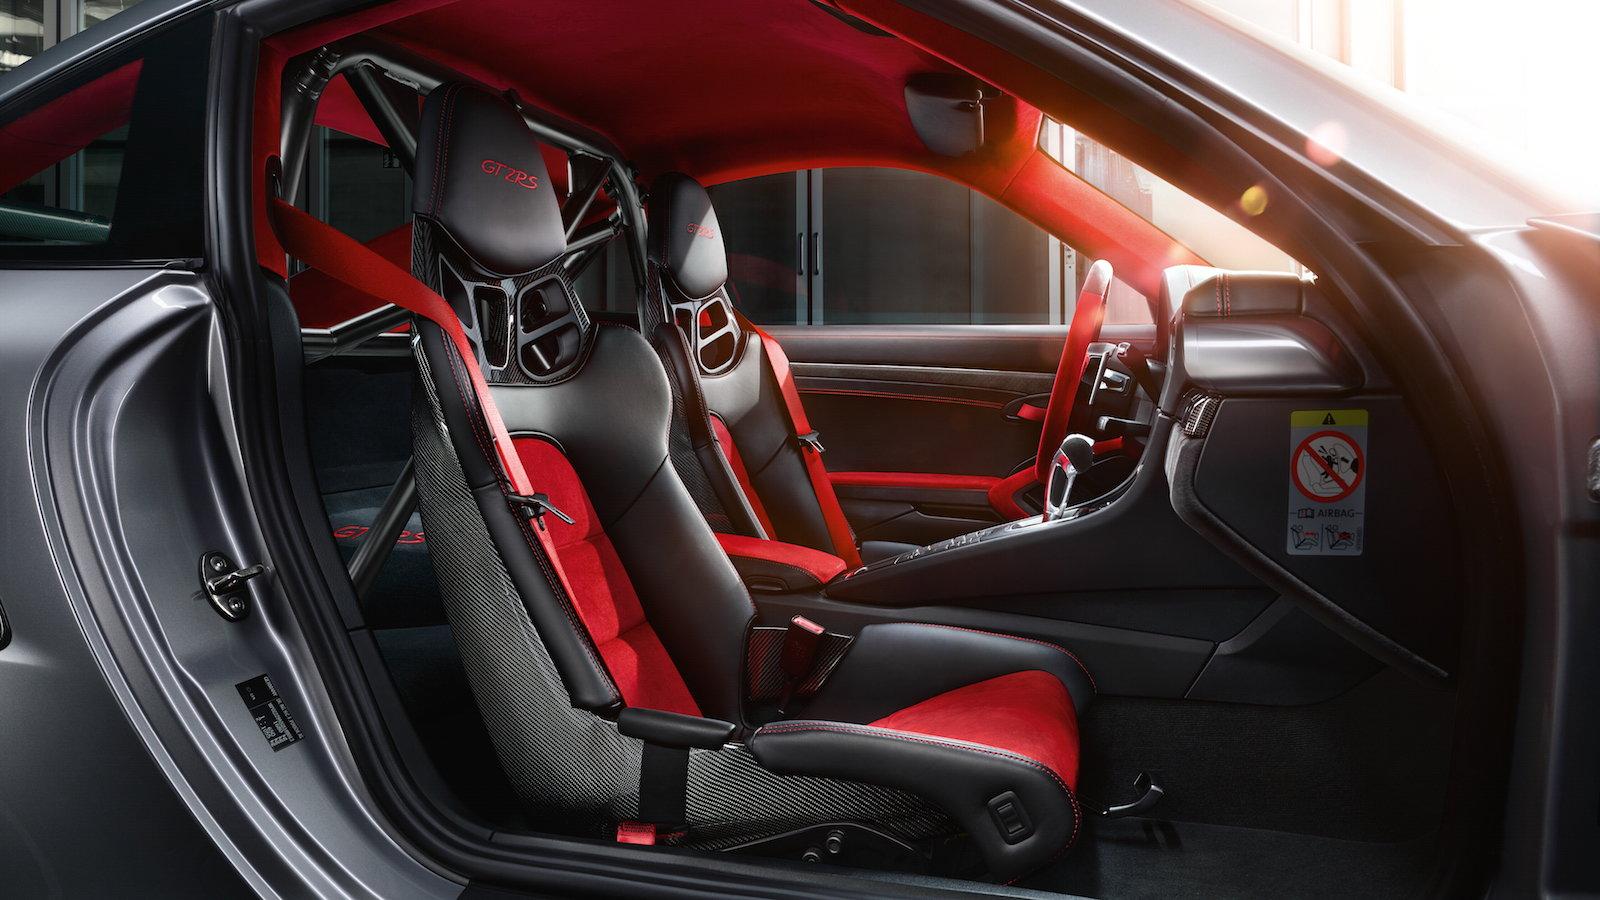 GT2 RS vs the 2019 Corvette ZR1